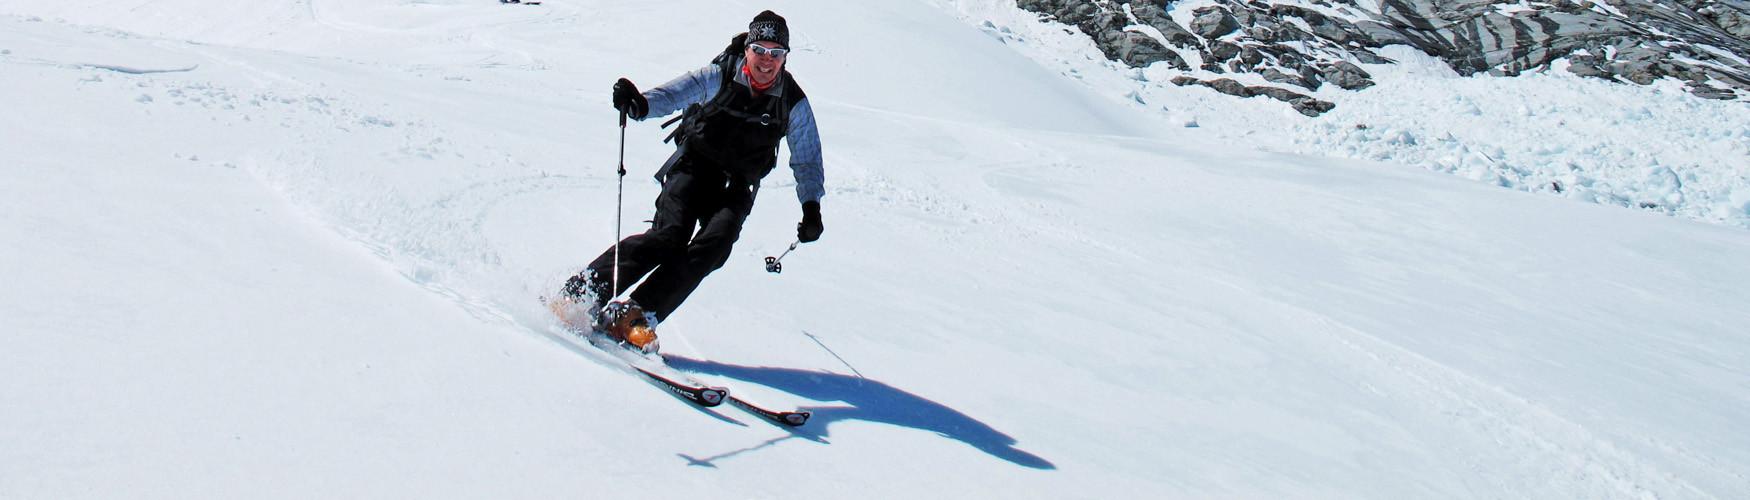 Heliski Freeride Zermatt